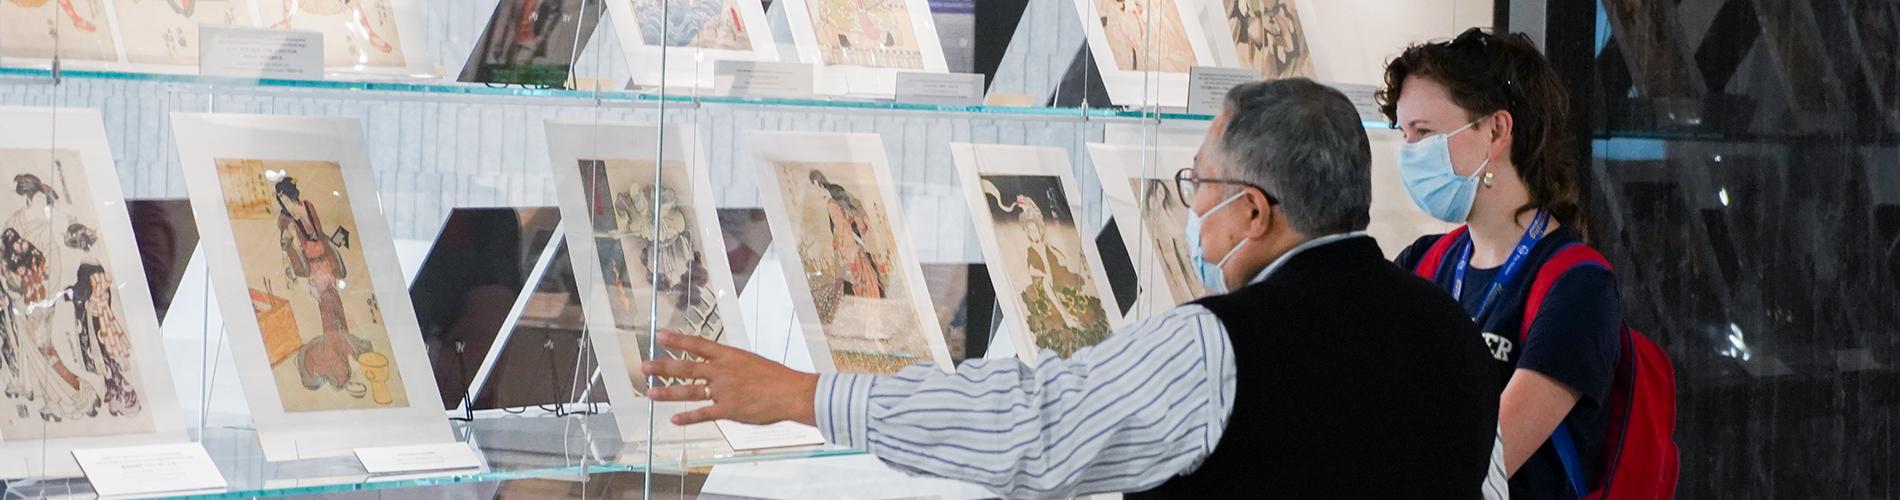 Librarian showing exhibit